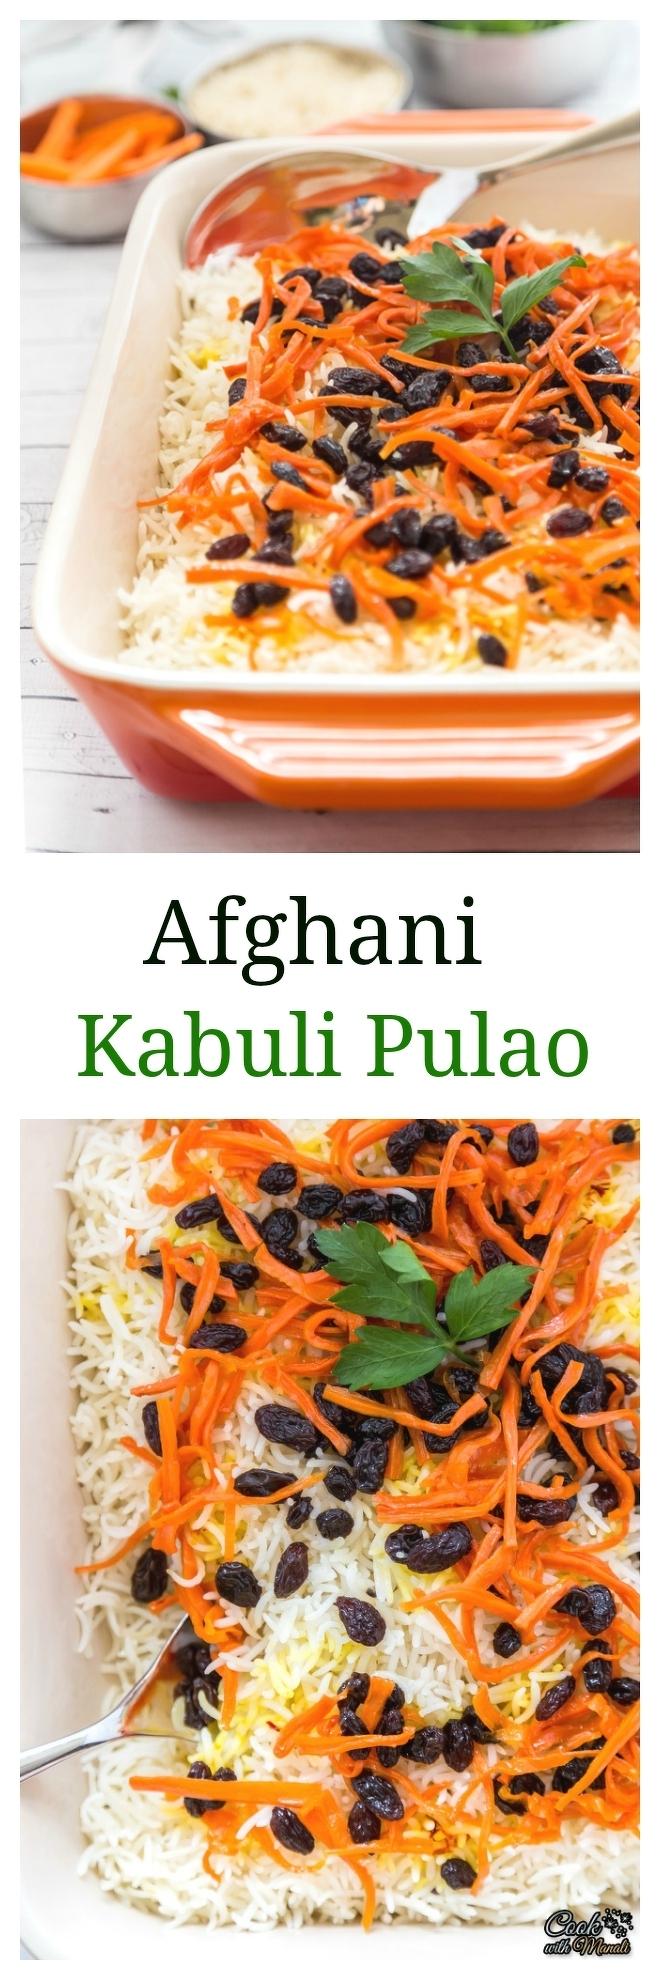 Afghan Kabuli Pulao Collage-nocwm